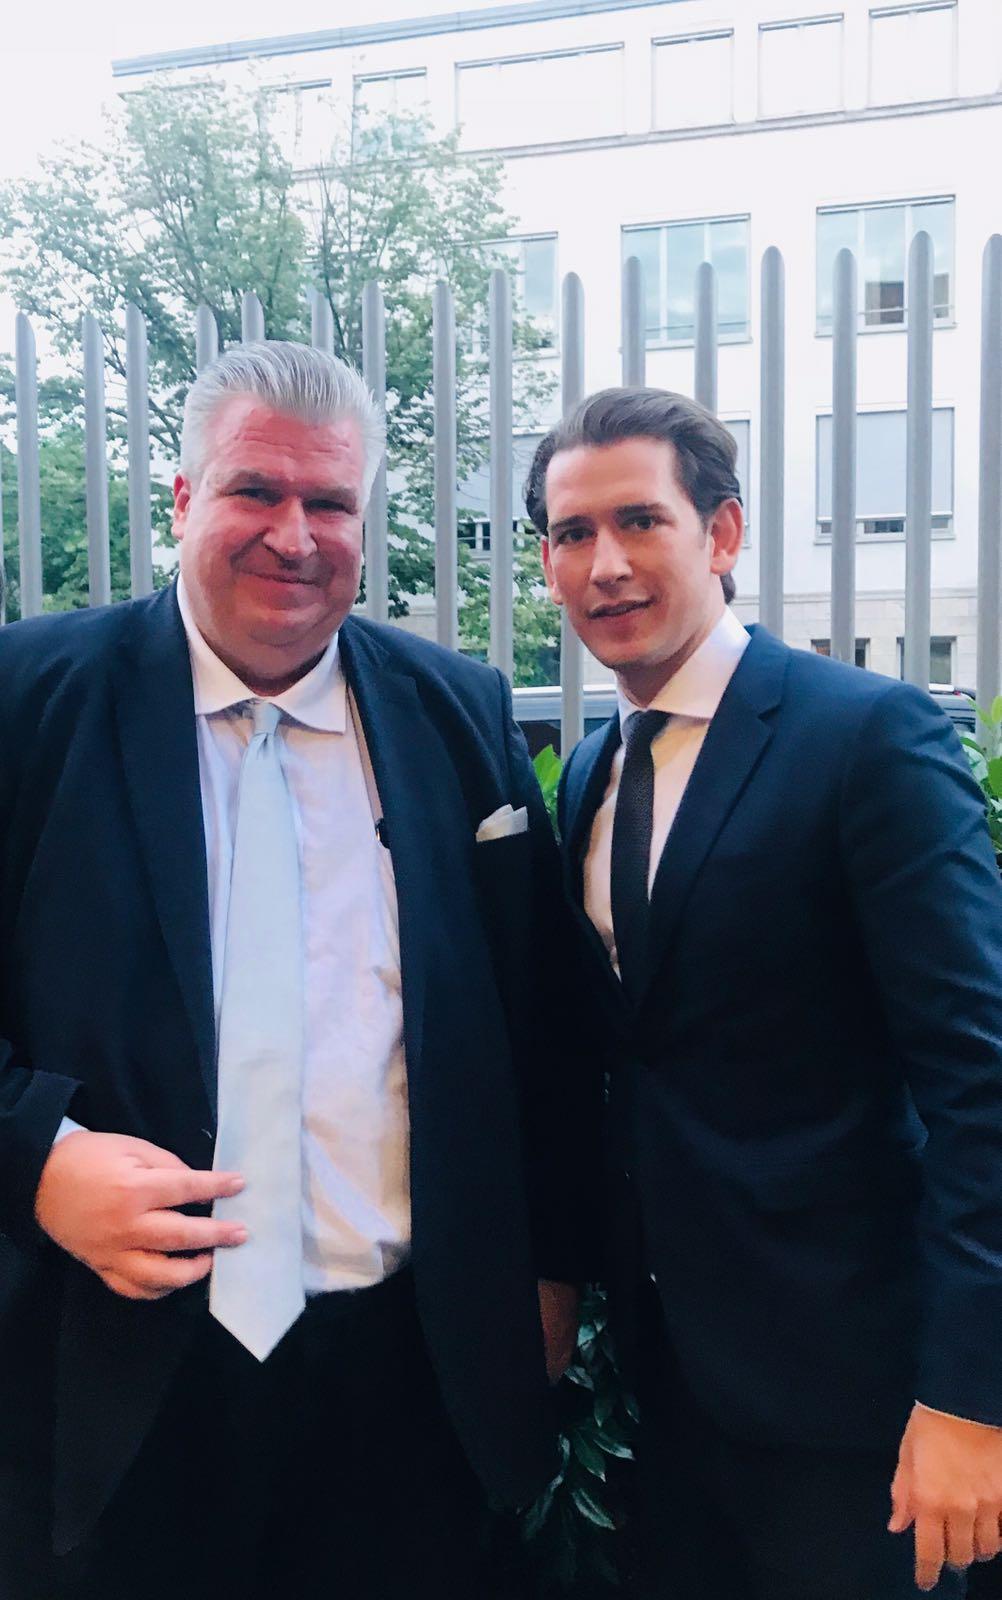 Naujoks trifft Bundeskanzler Kurz